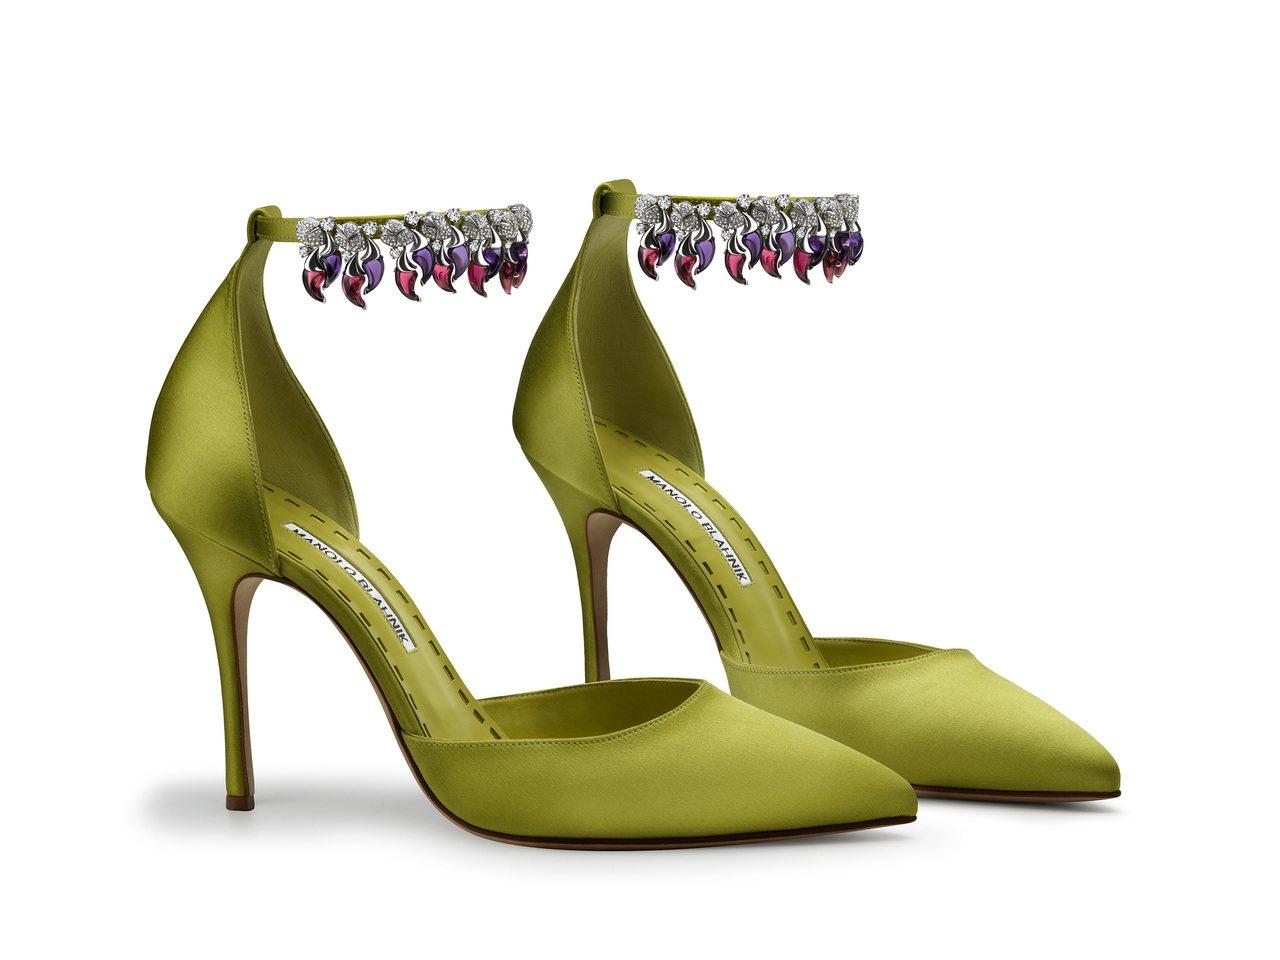 Manolo Blahnik x Bulgari 聯名限量珠寶綠絲緞淺口高跟鞋。...